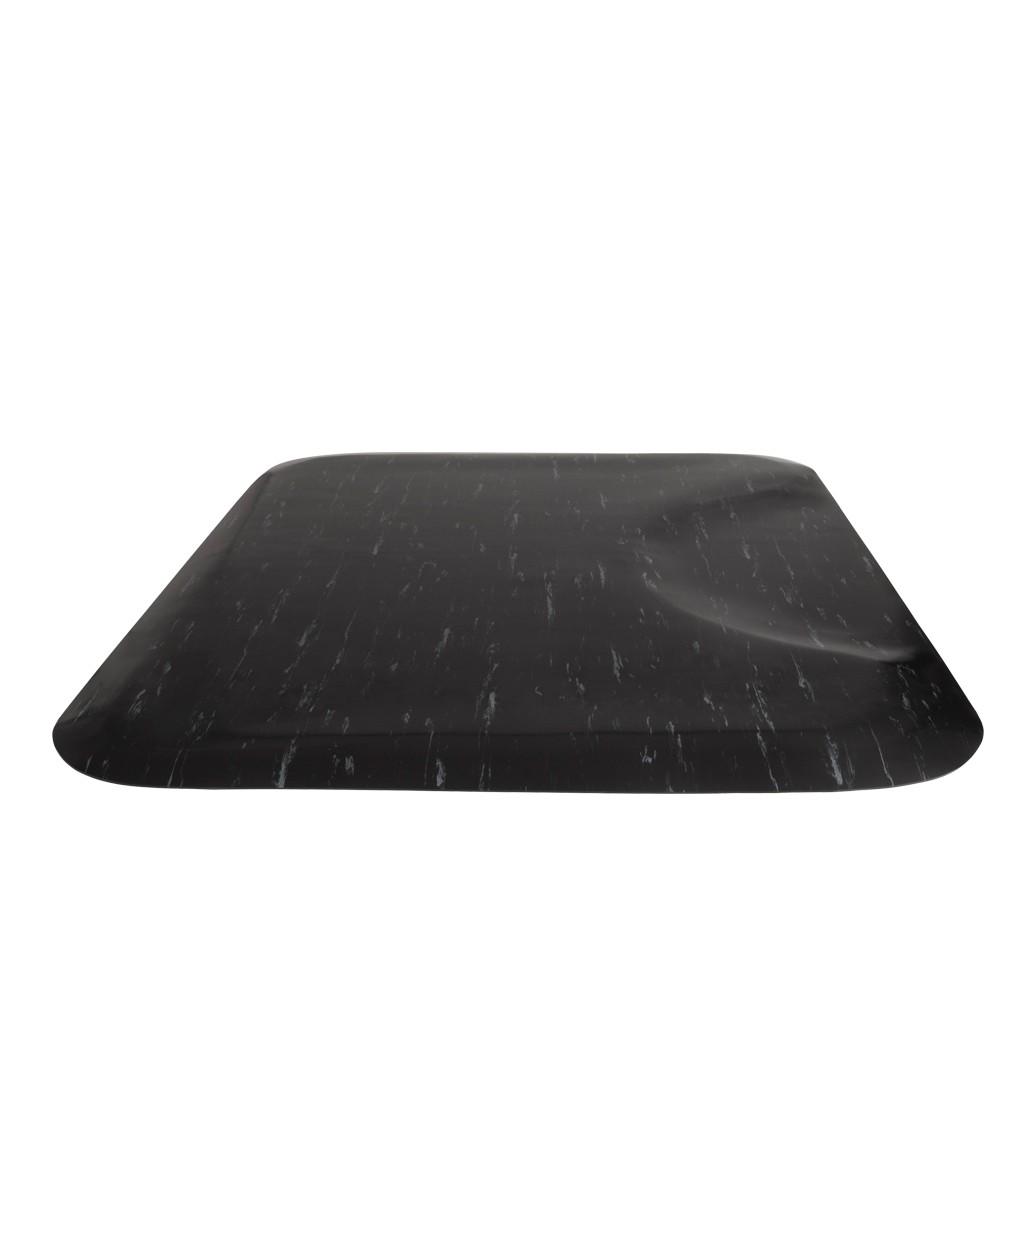 salon chair mat indoor hammock stand 3 39 x 4 anti fatigue rectangular marble 8 quot